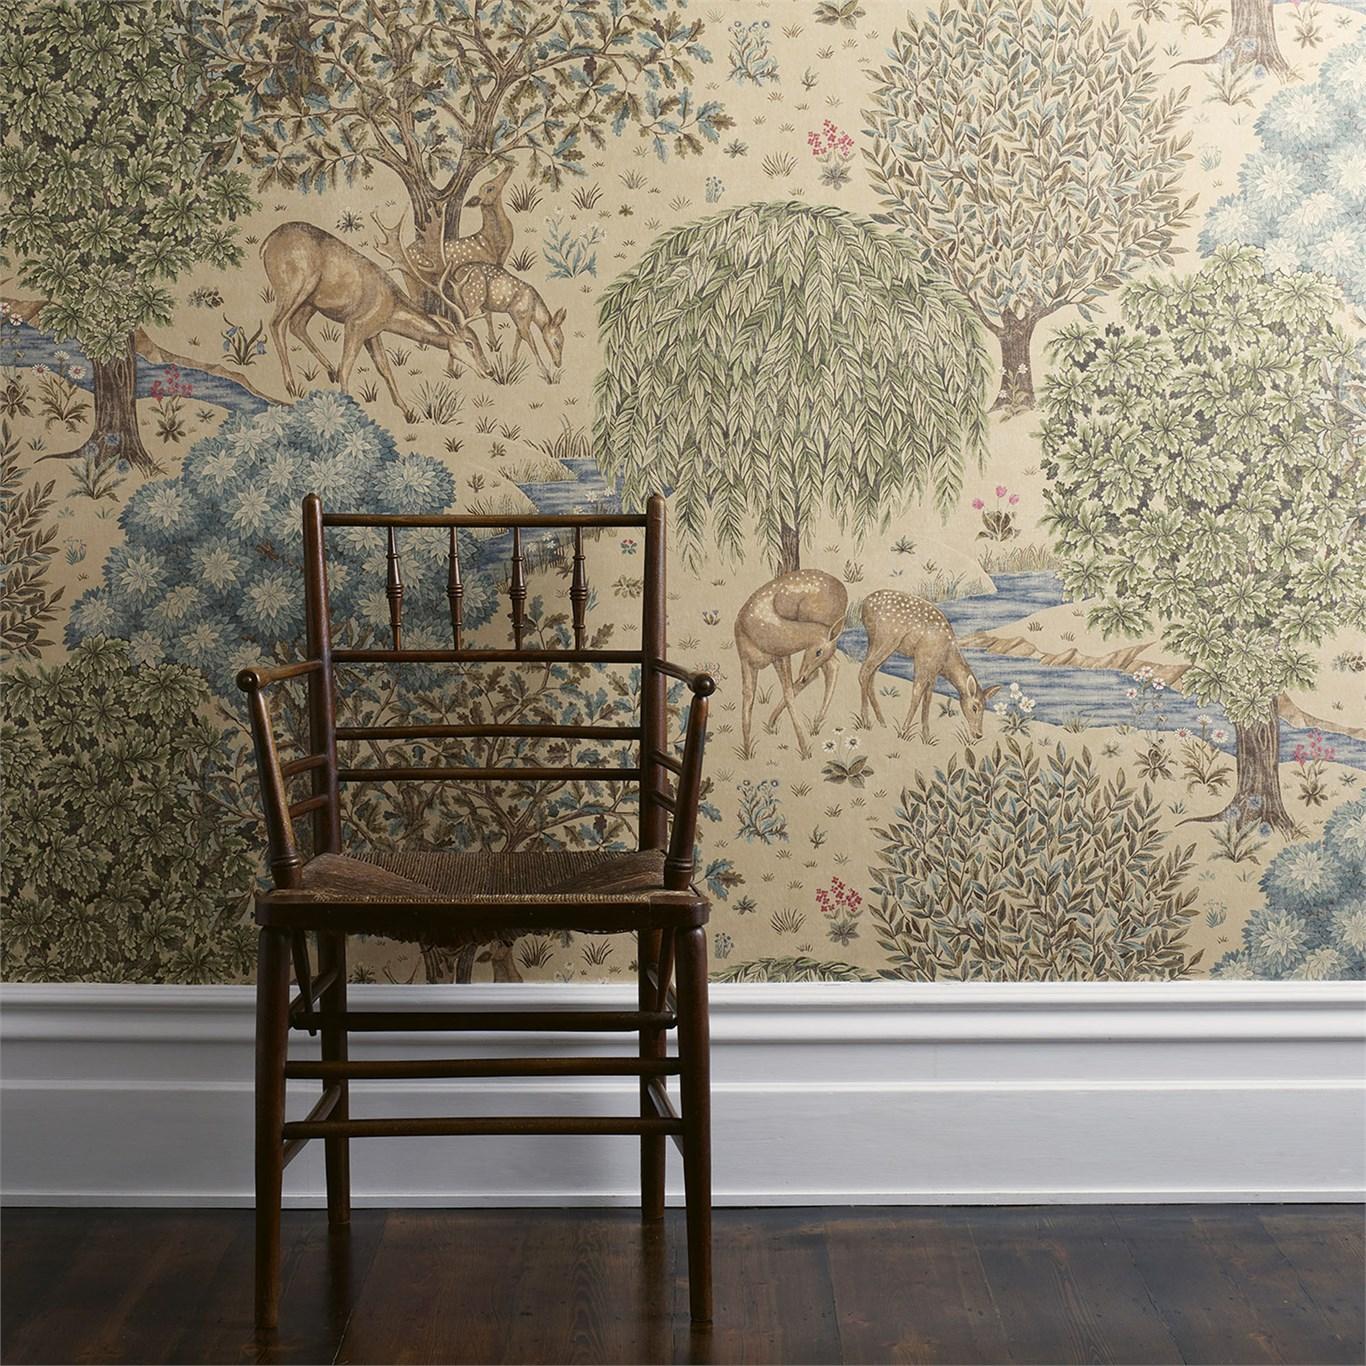 Digital printed wallpaper, inspired on a tapestry Morris designed.